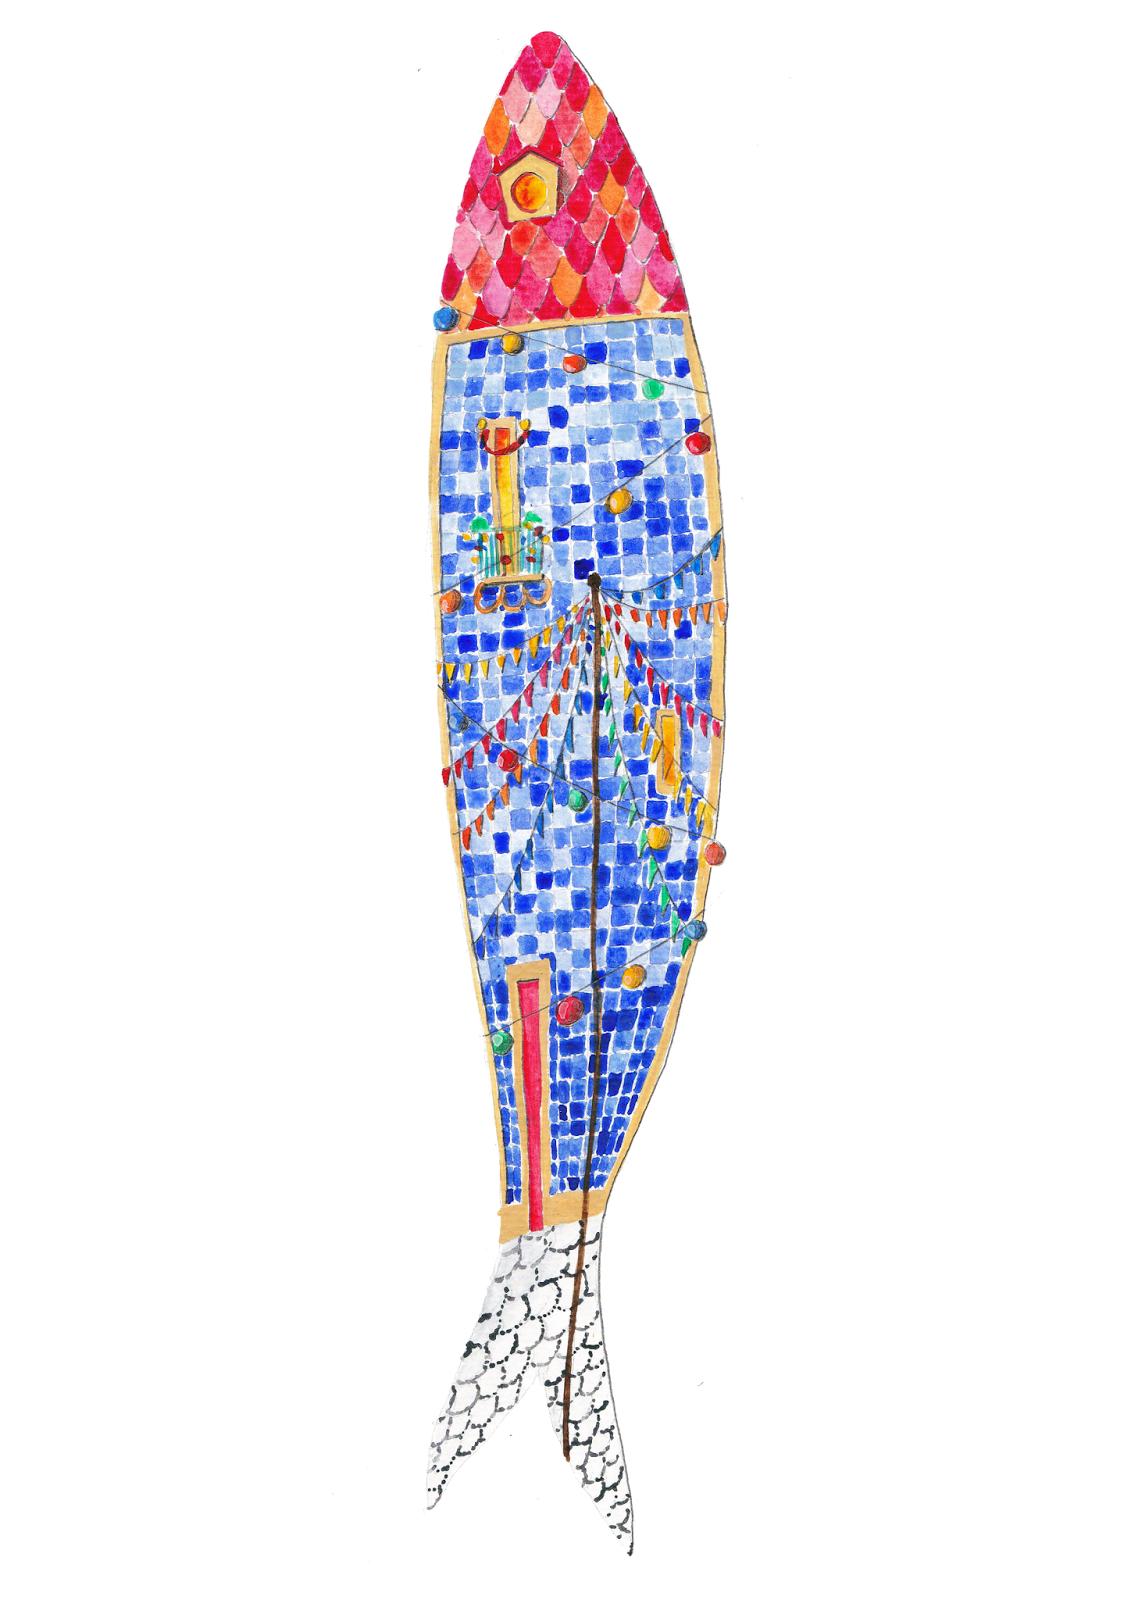 sardinhas lisboa - Buscar con Google